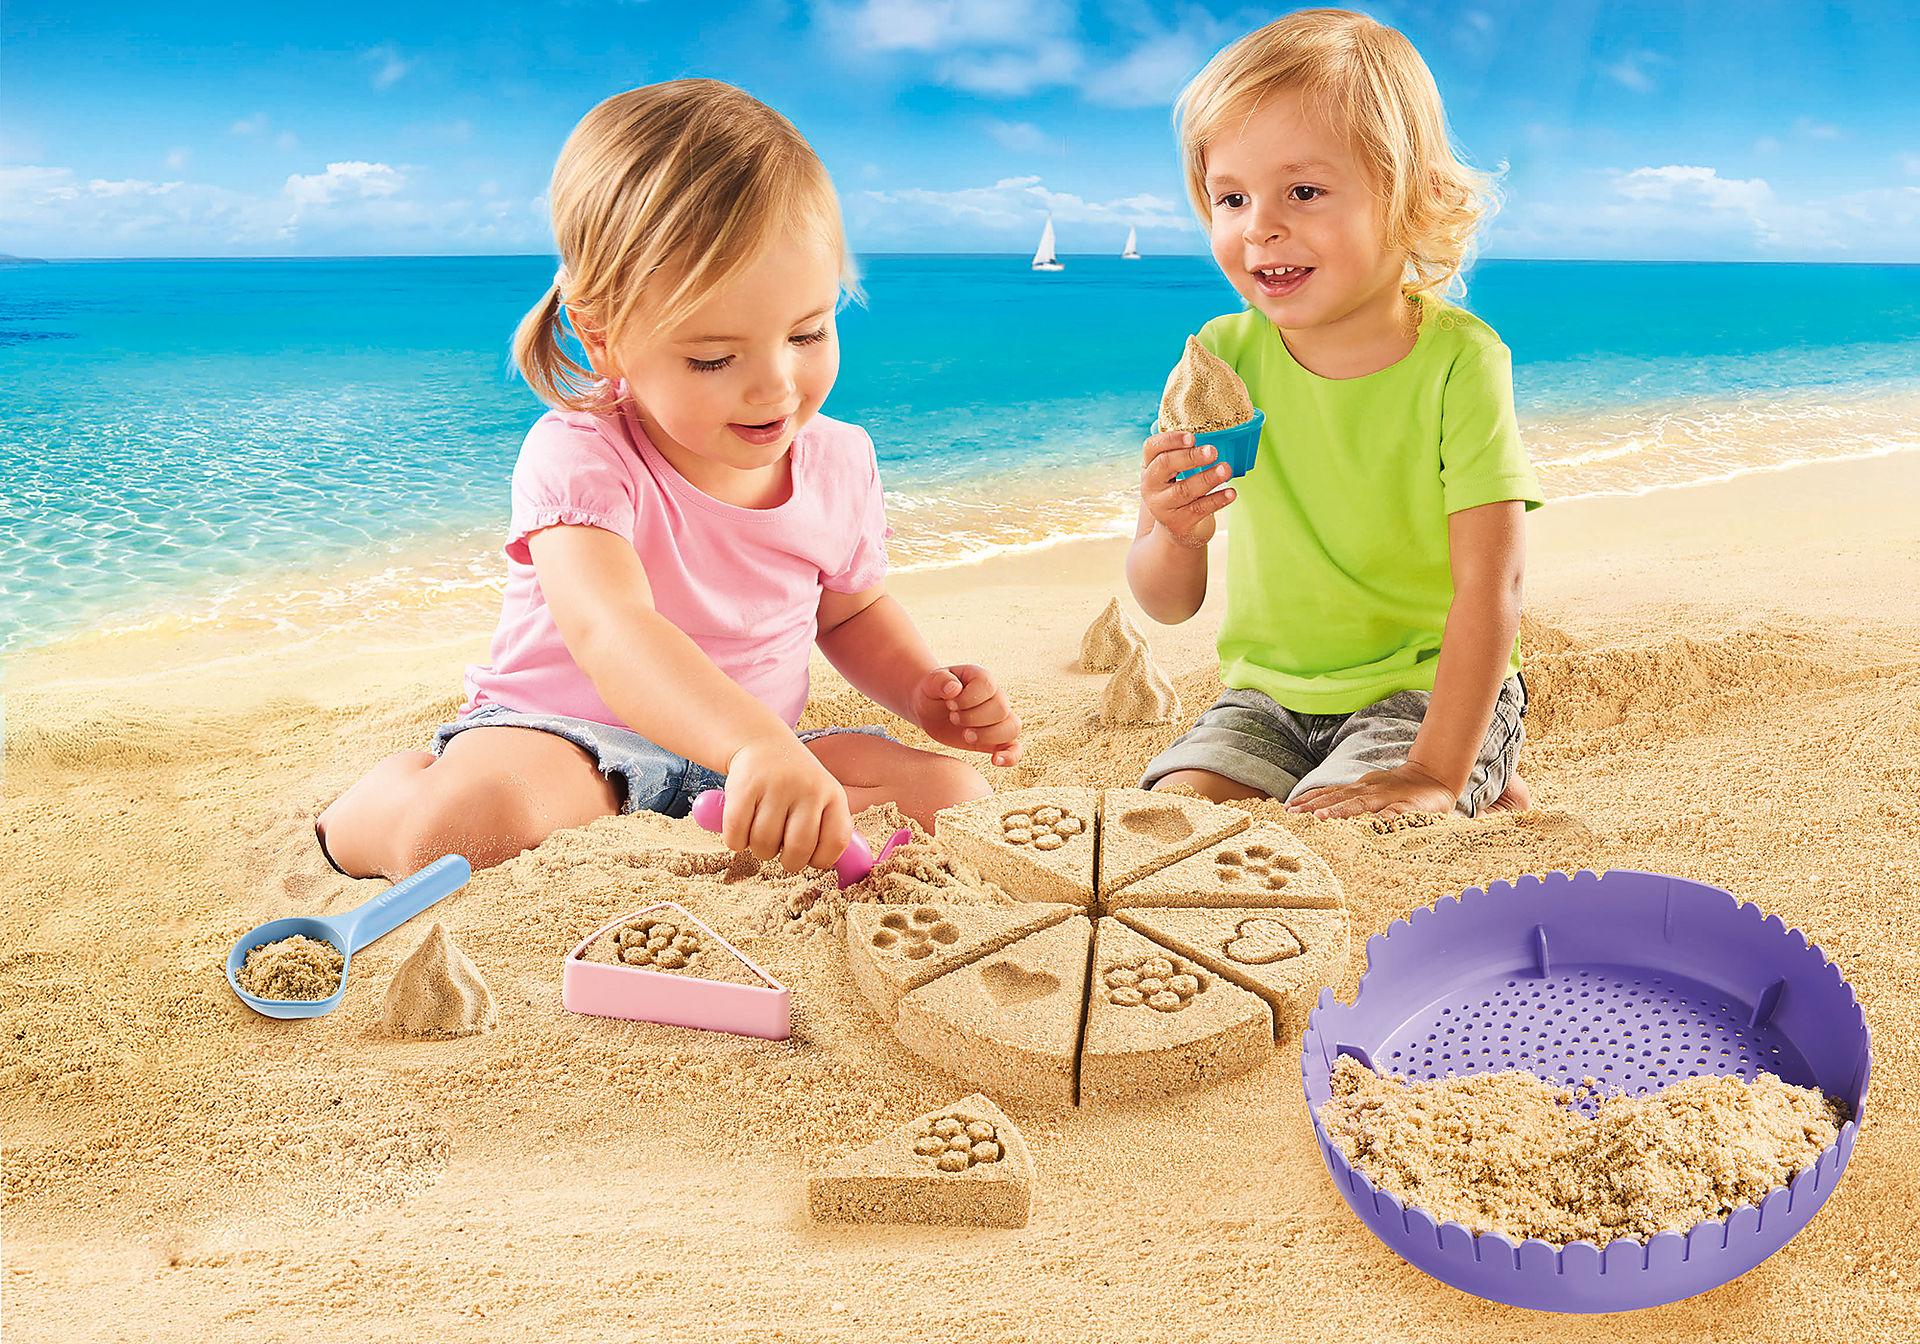 70339 Boulangerie des sables zoom image8